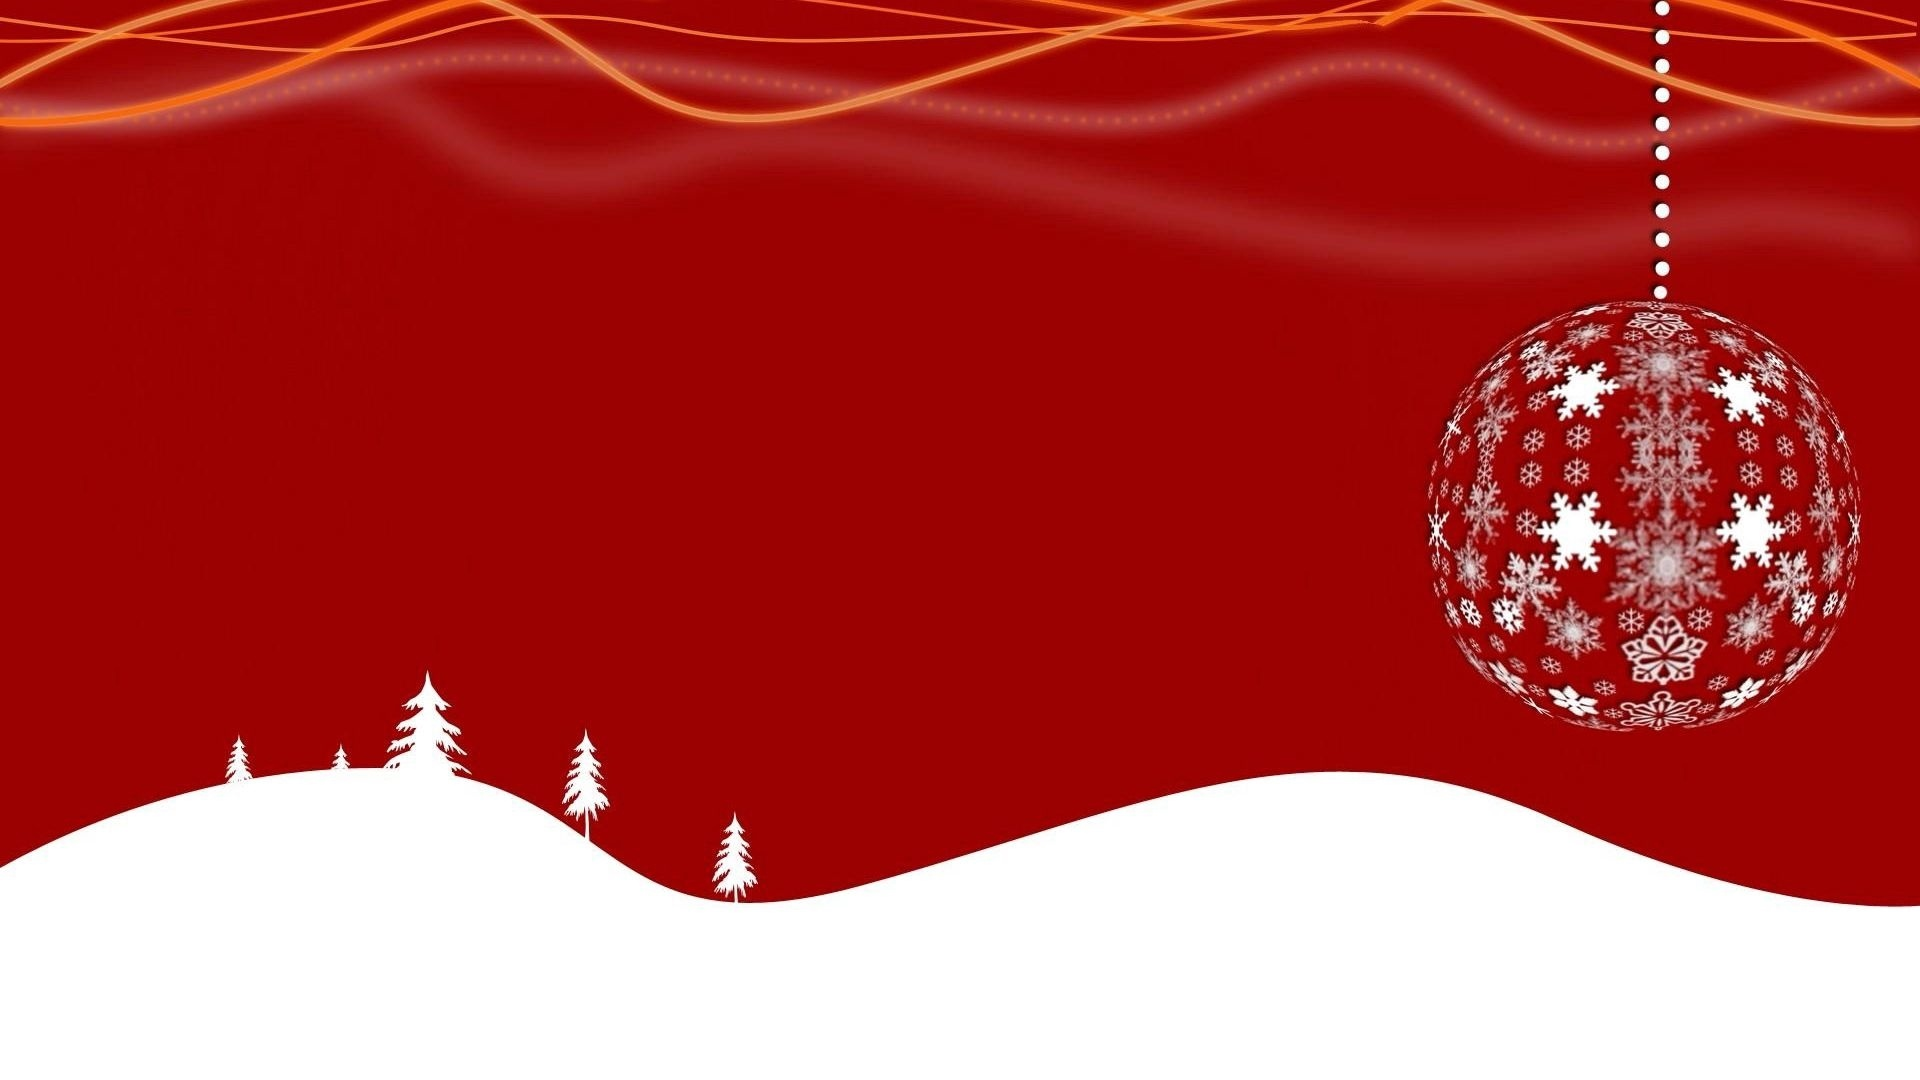 Christmas Red Desktop Wallpaper